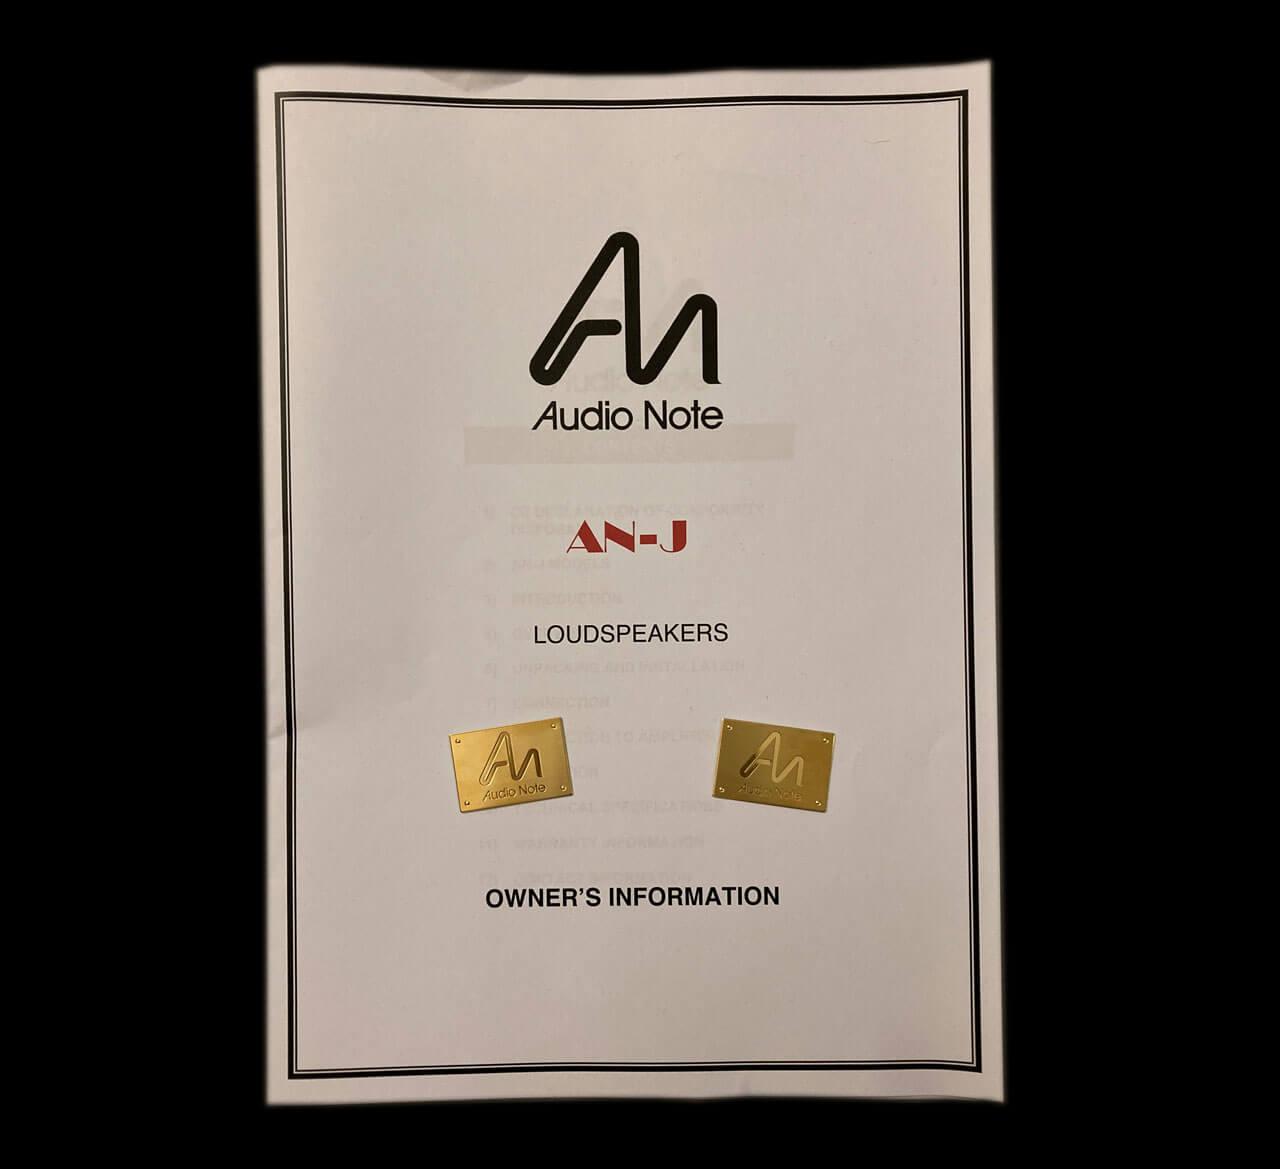 Audio Note AN-J/LX HEMP: Owner's Information